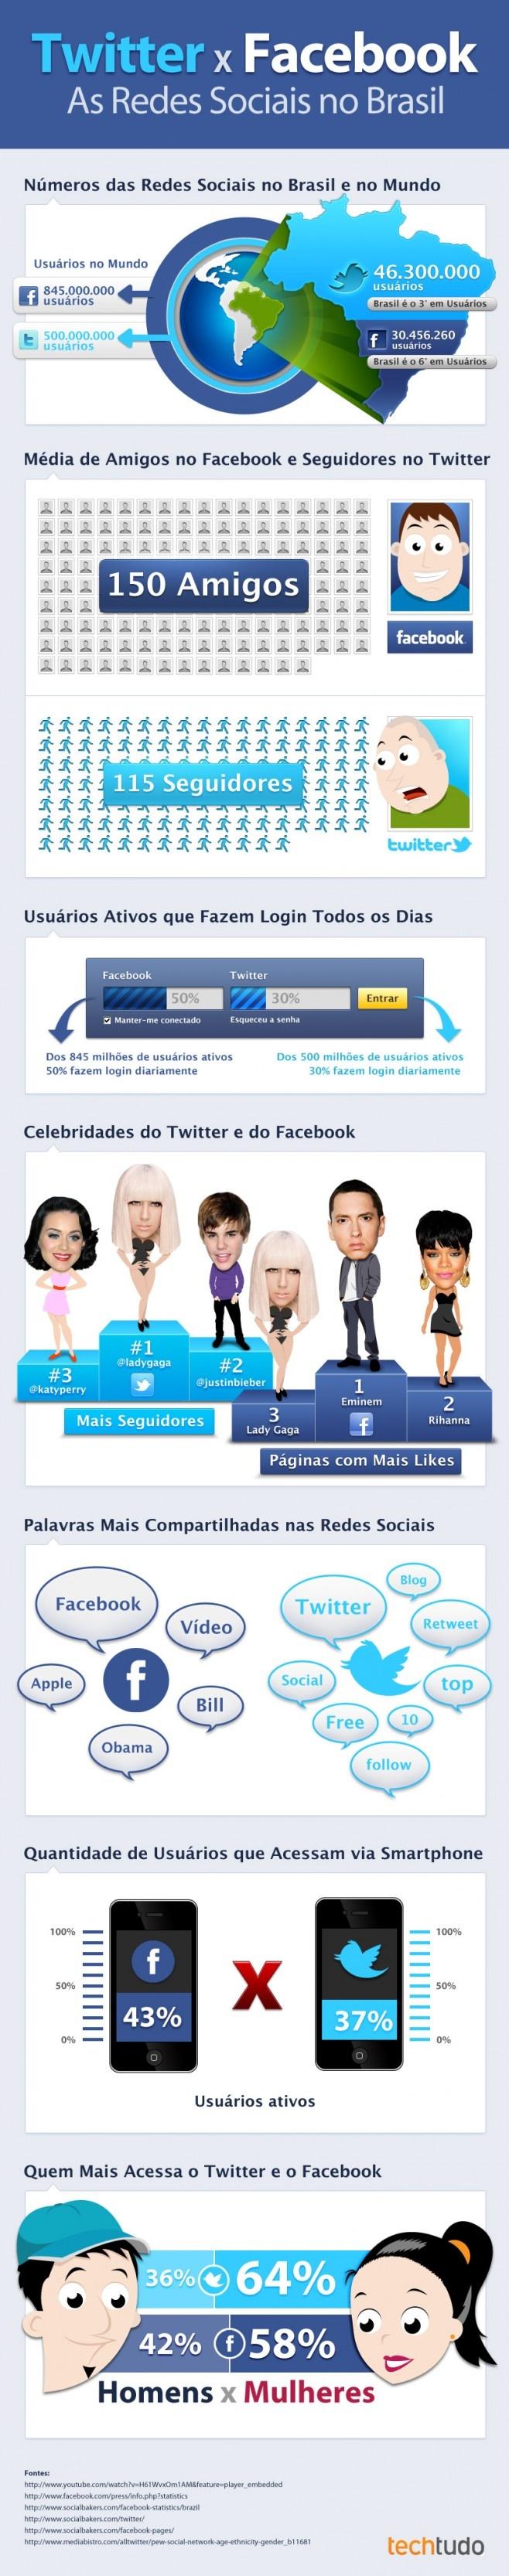 Twitter y Facebook en Brasil #infografia